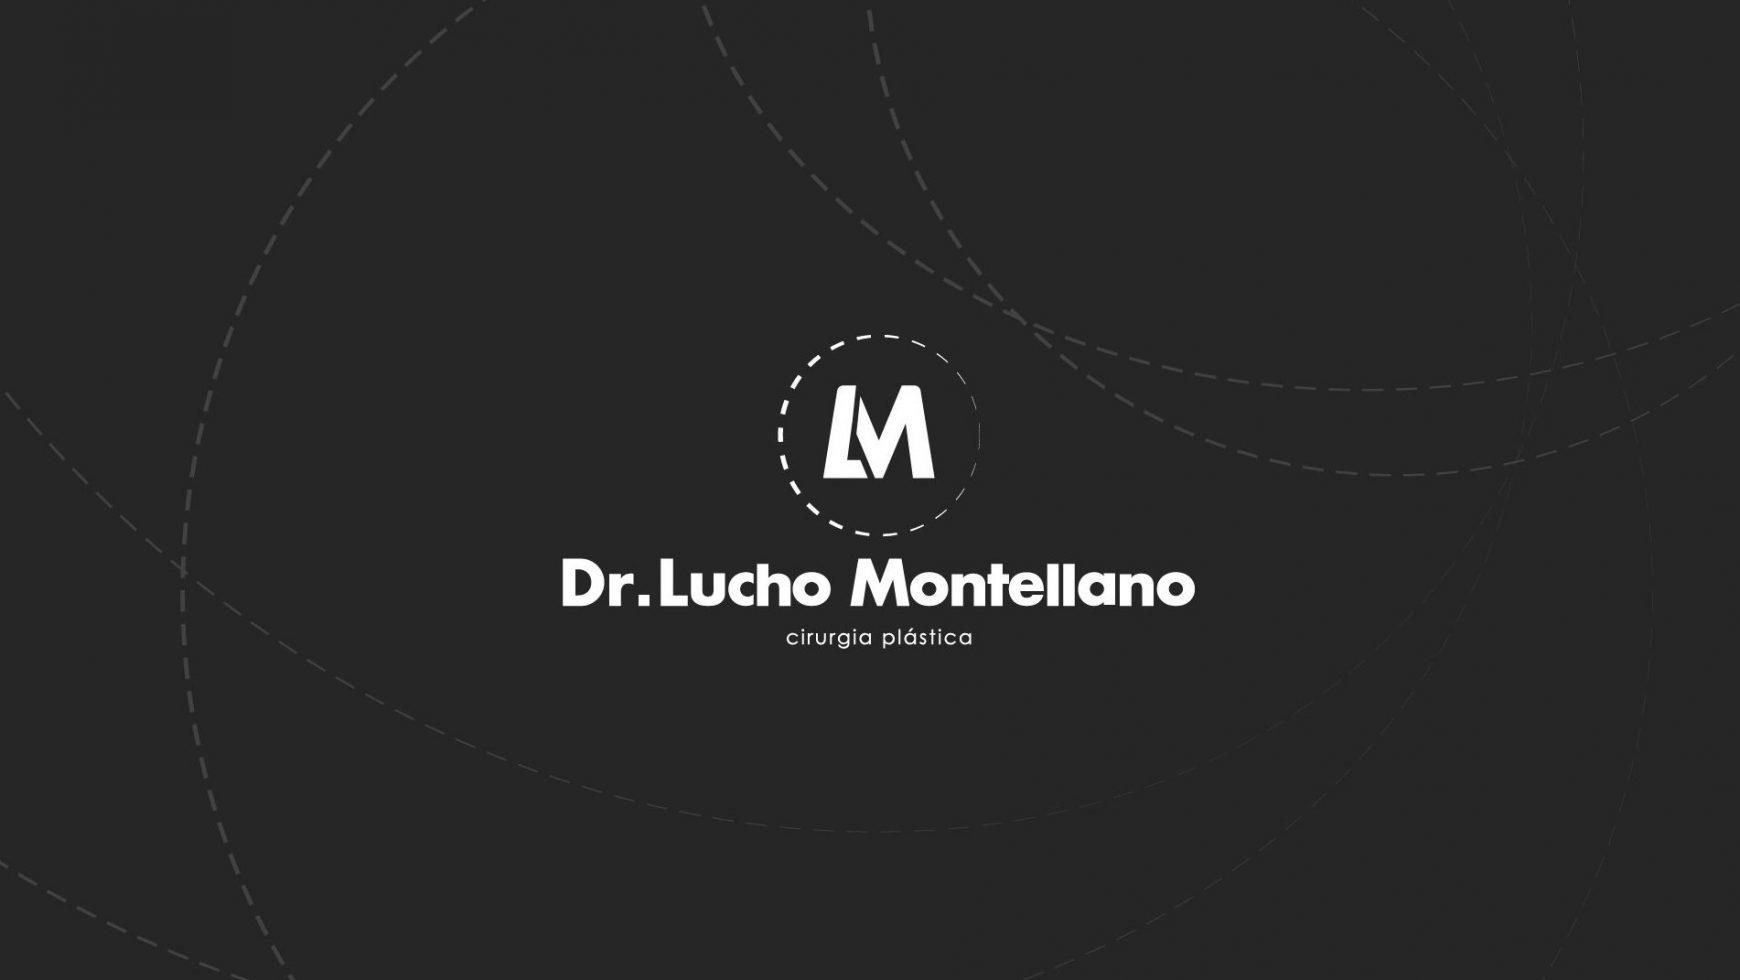 Dr Lucho Montellano